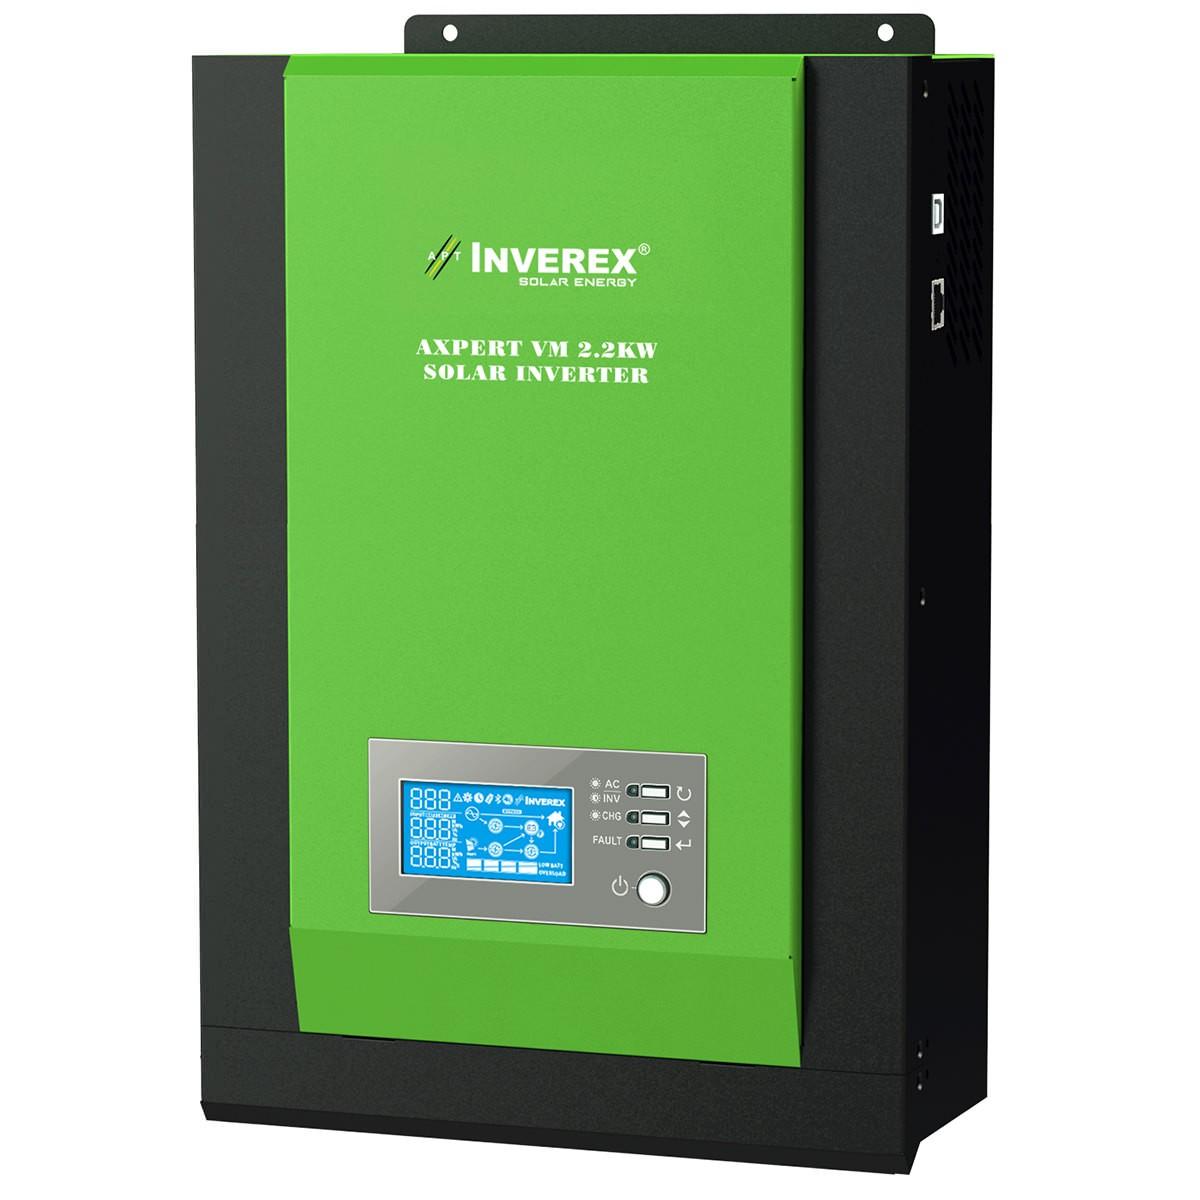 Amazing Inverex Axpert Vm 2 2Kw Mppt Solar Inverters Smart E Shop Wiring Digital Resources Inklcompassionincorg